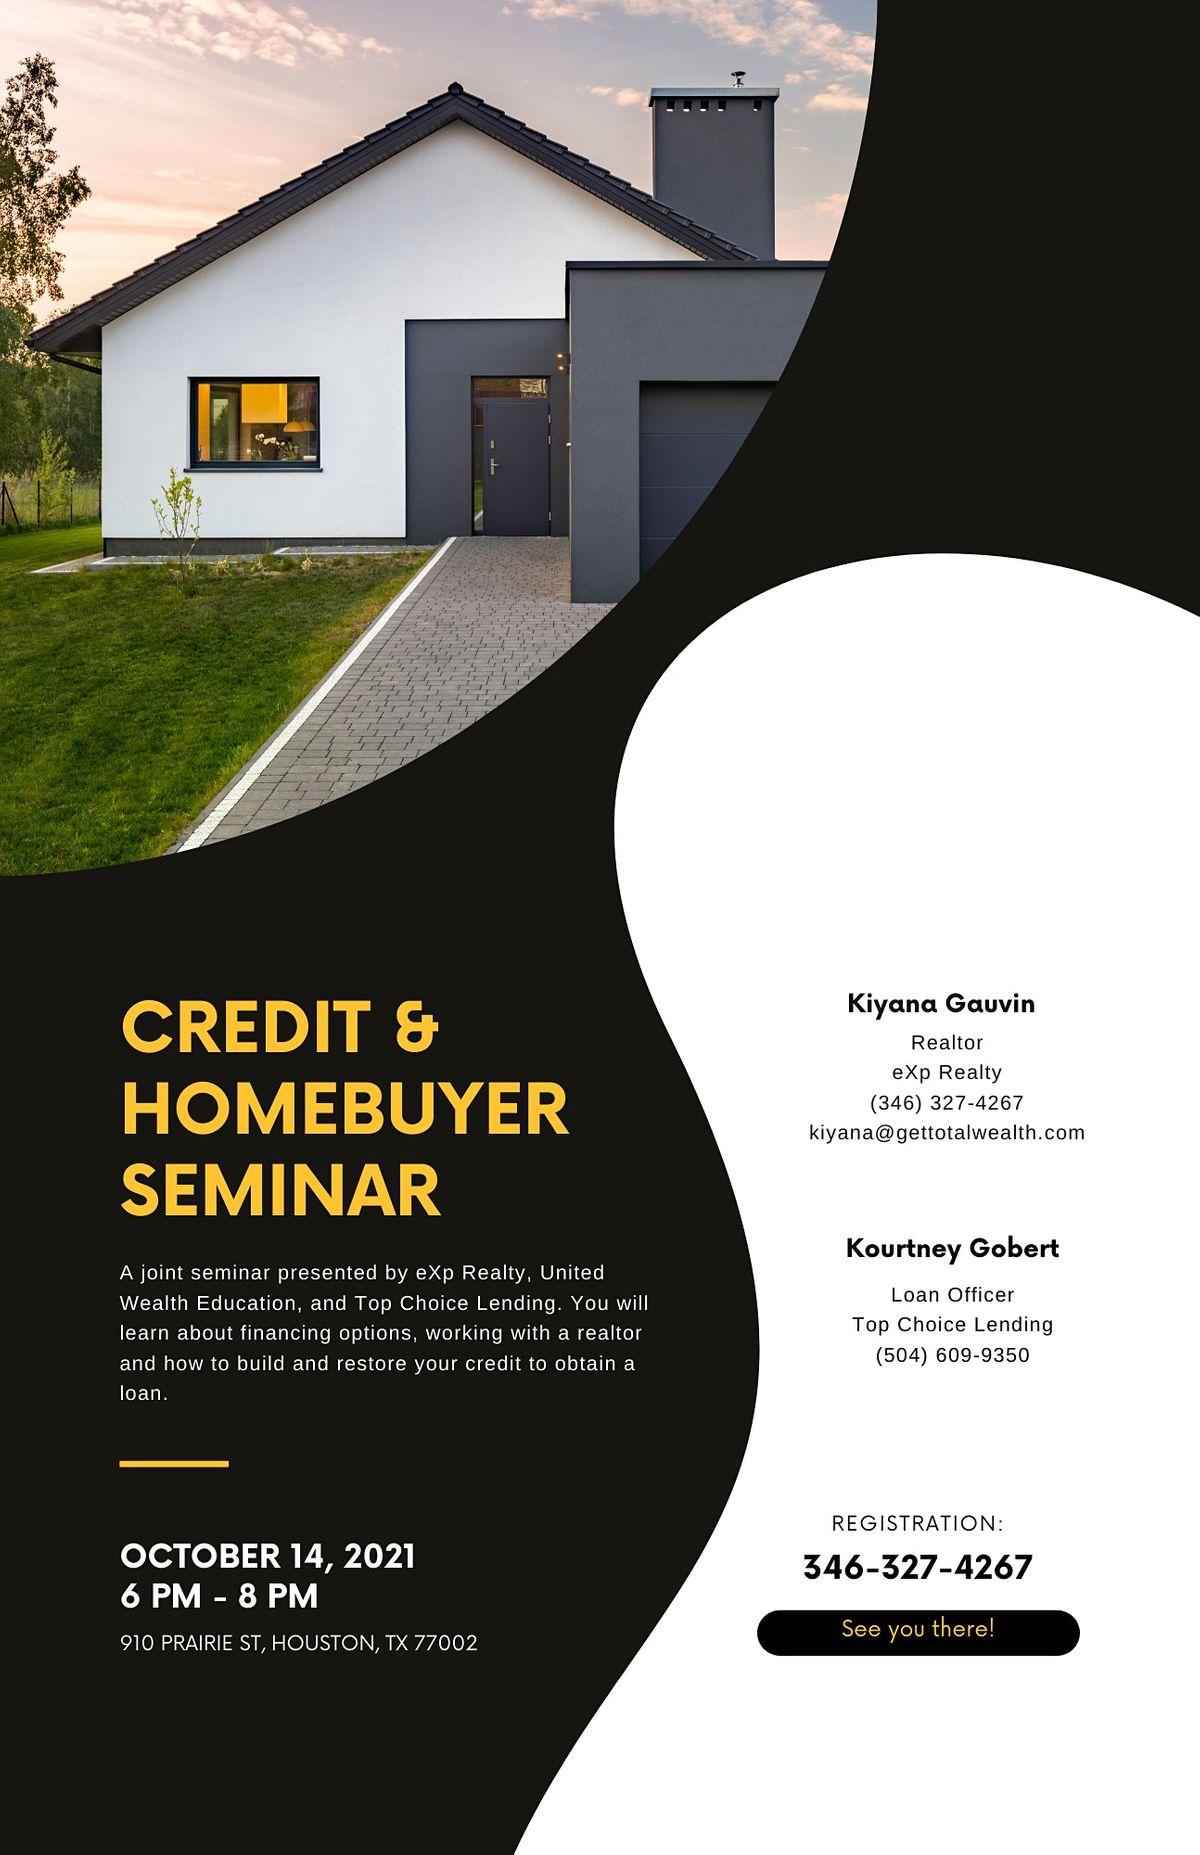 Credit & Homebuyer Seminar